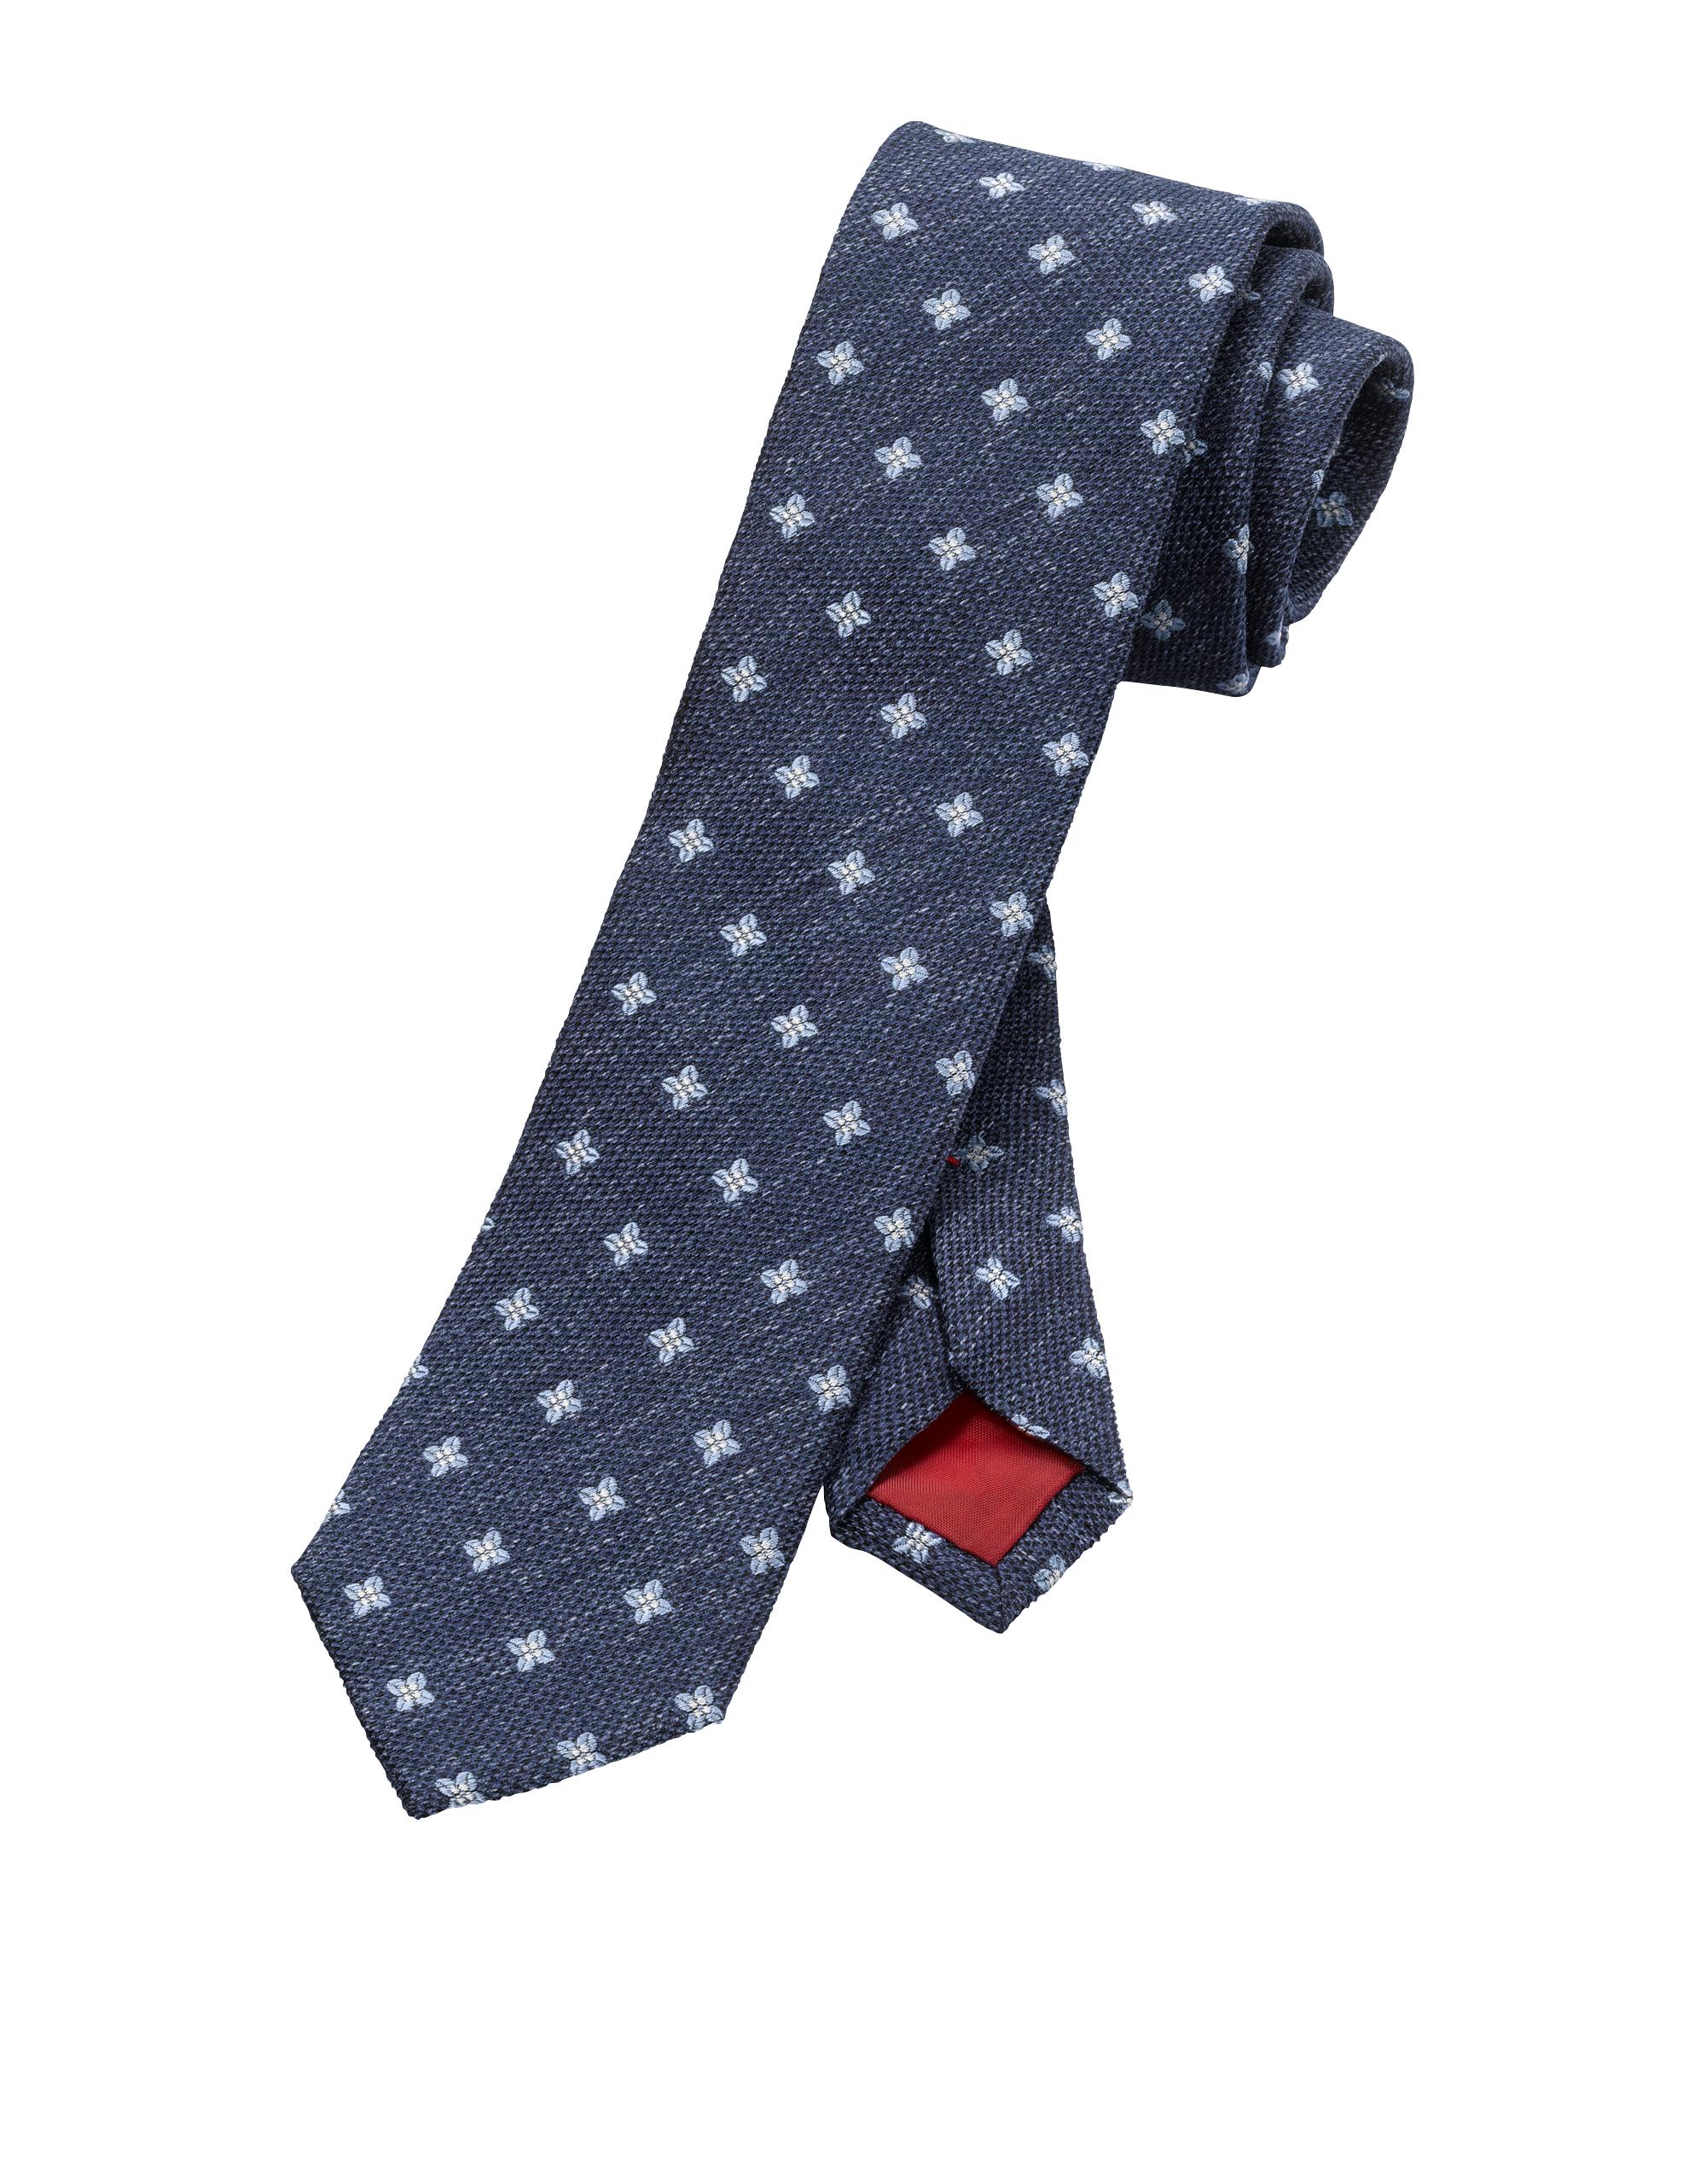 OLYMP Krawatte, Bleu, | Accessoires > Krawatten > Sonstige Krawatten | Bleu | 100% seide | OLYMP Krawatte